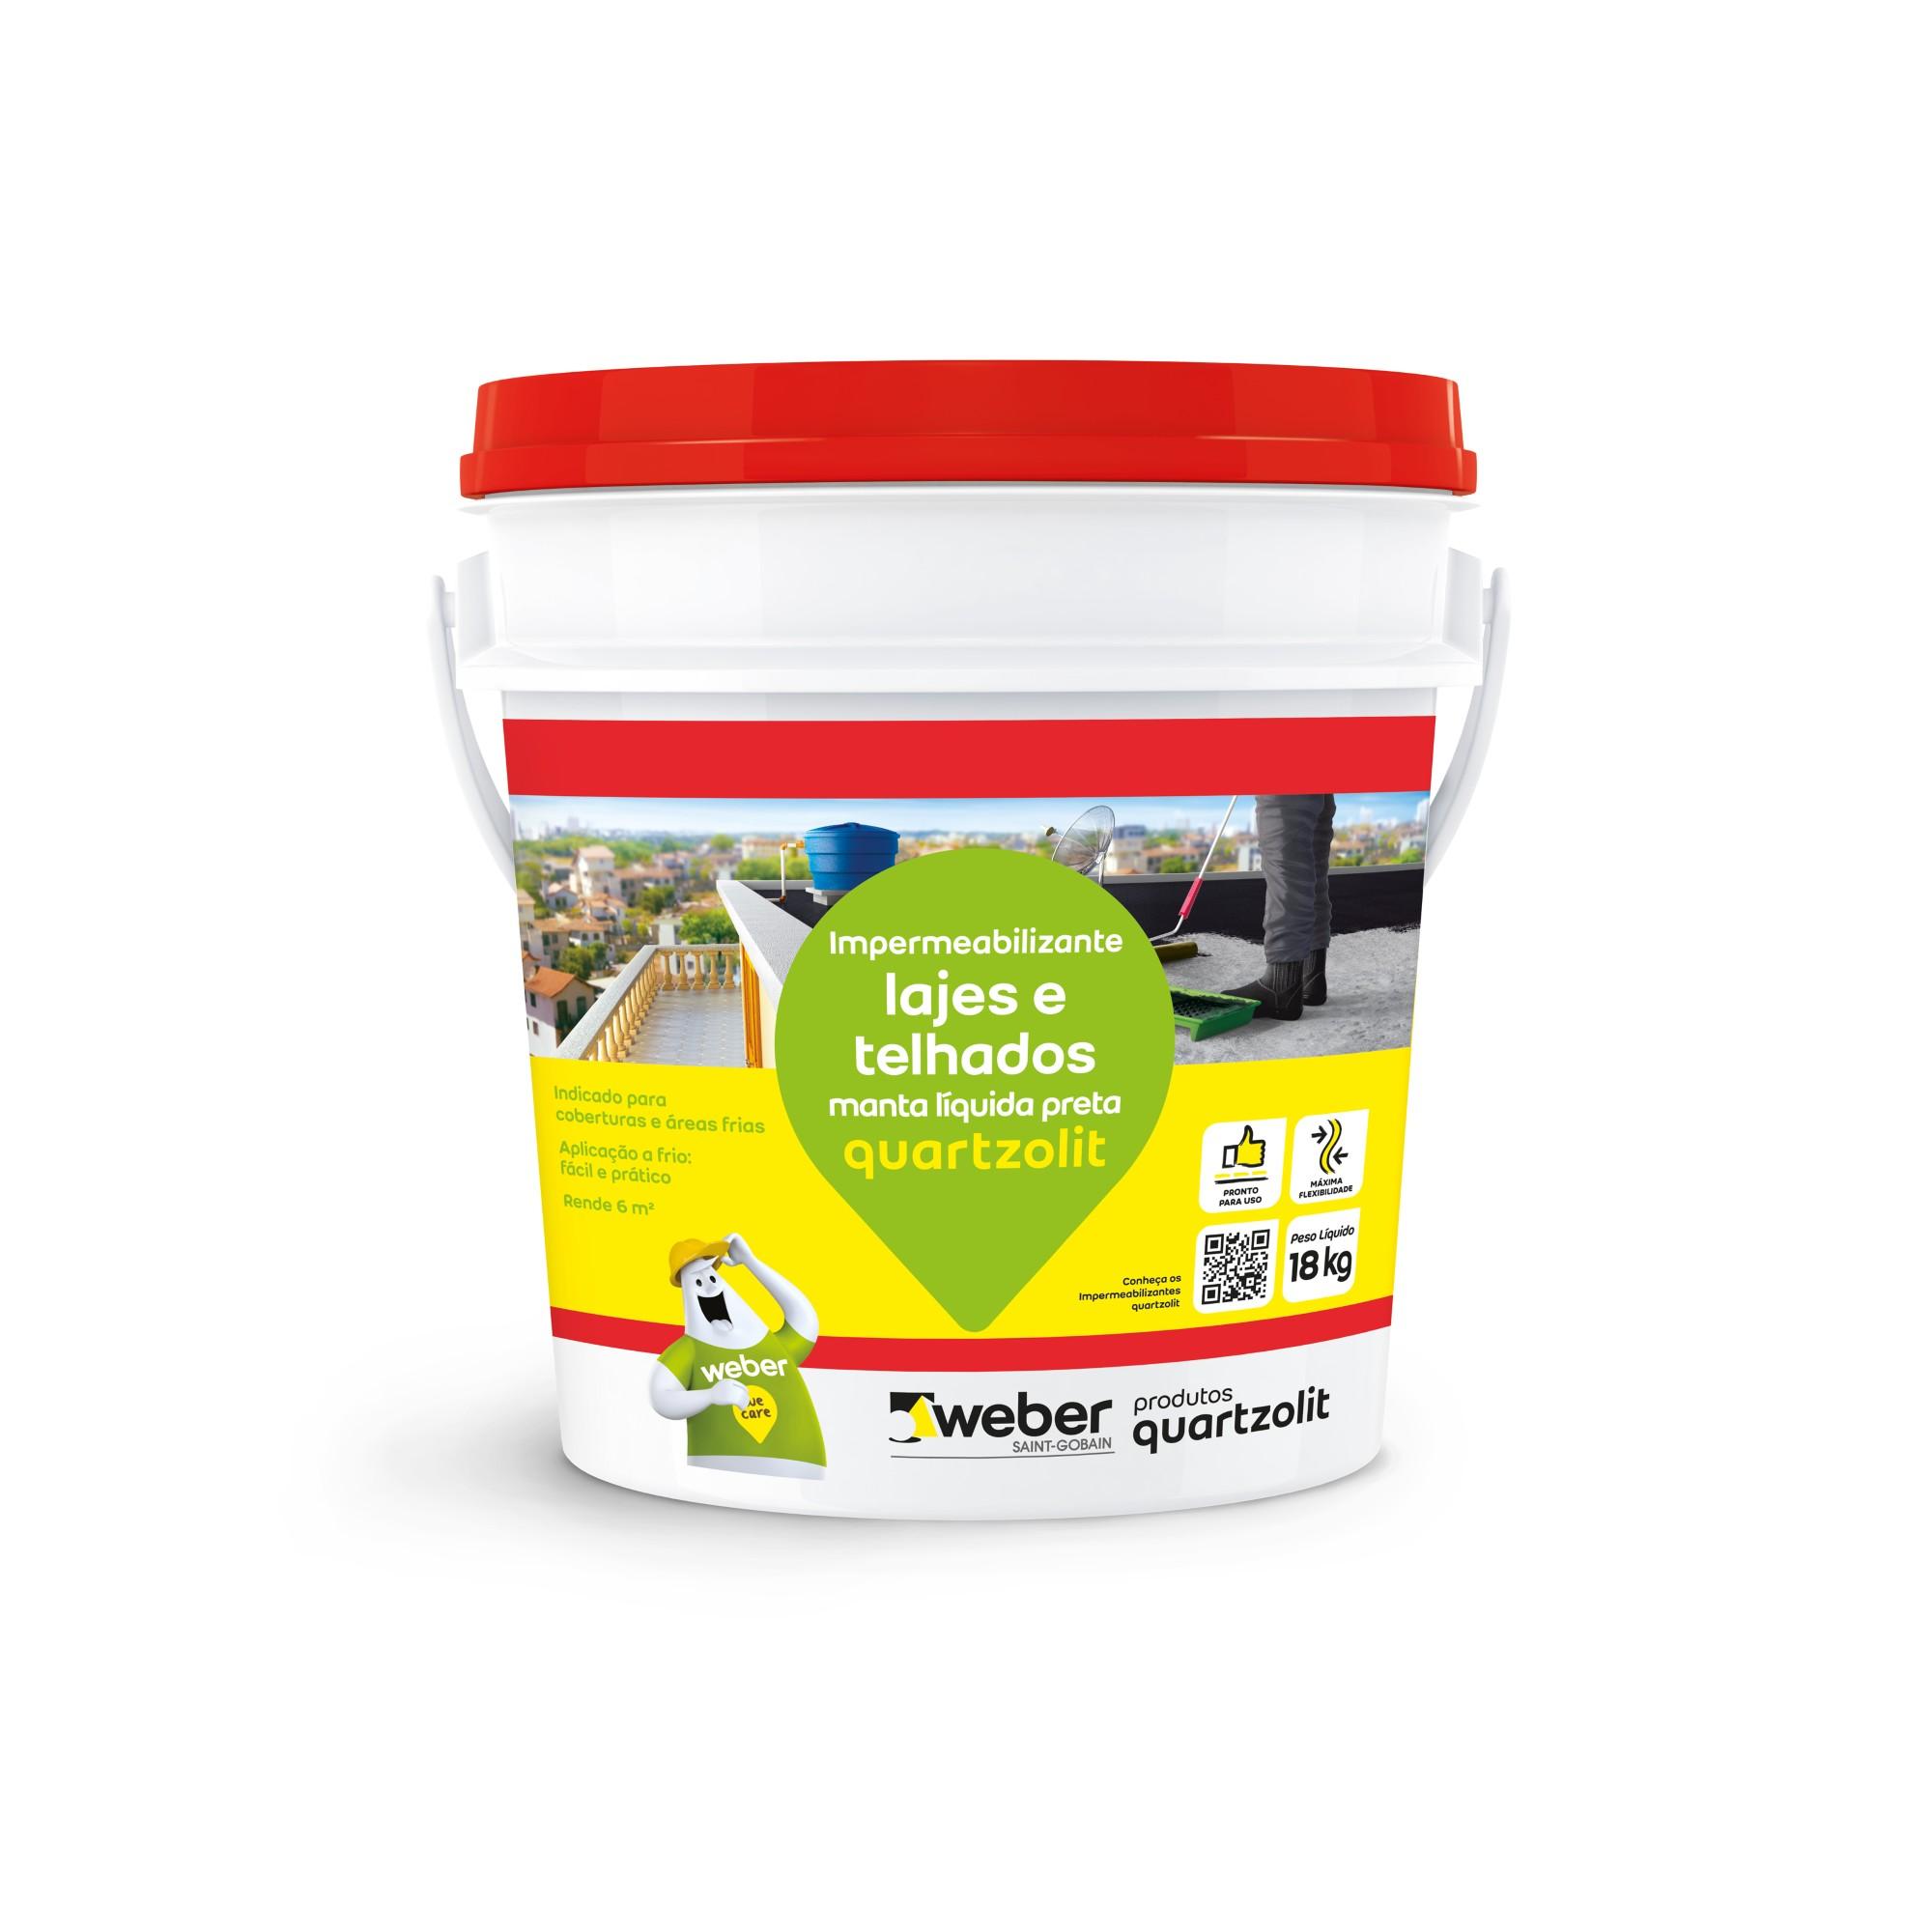 Manta Liquida Preta 18 Kg - Quartzolit